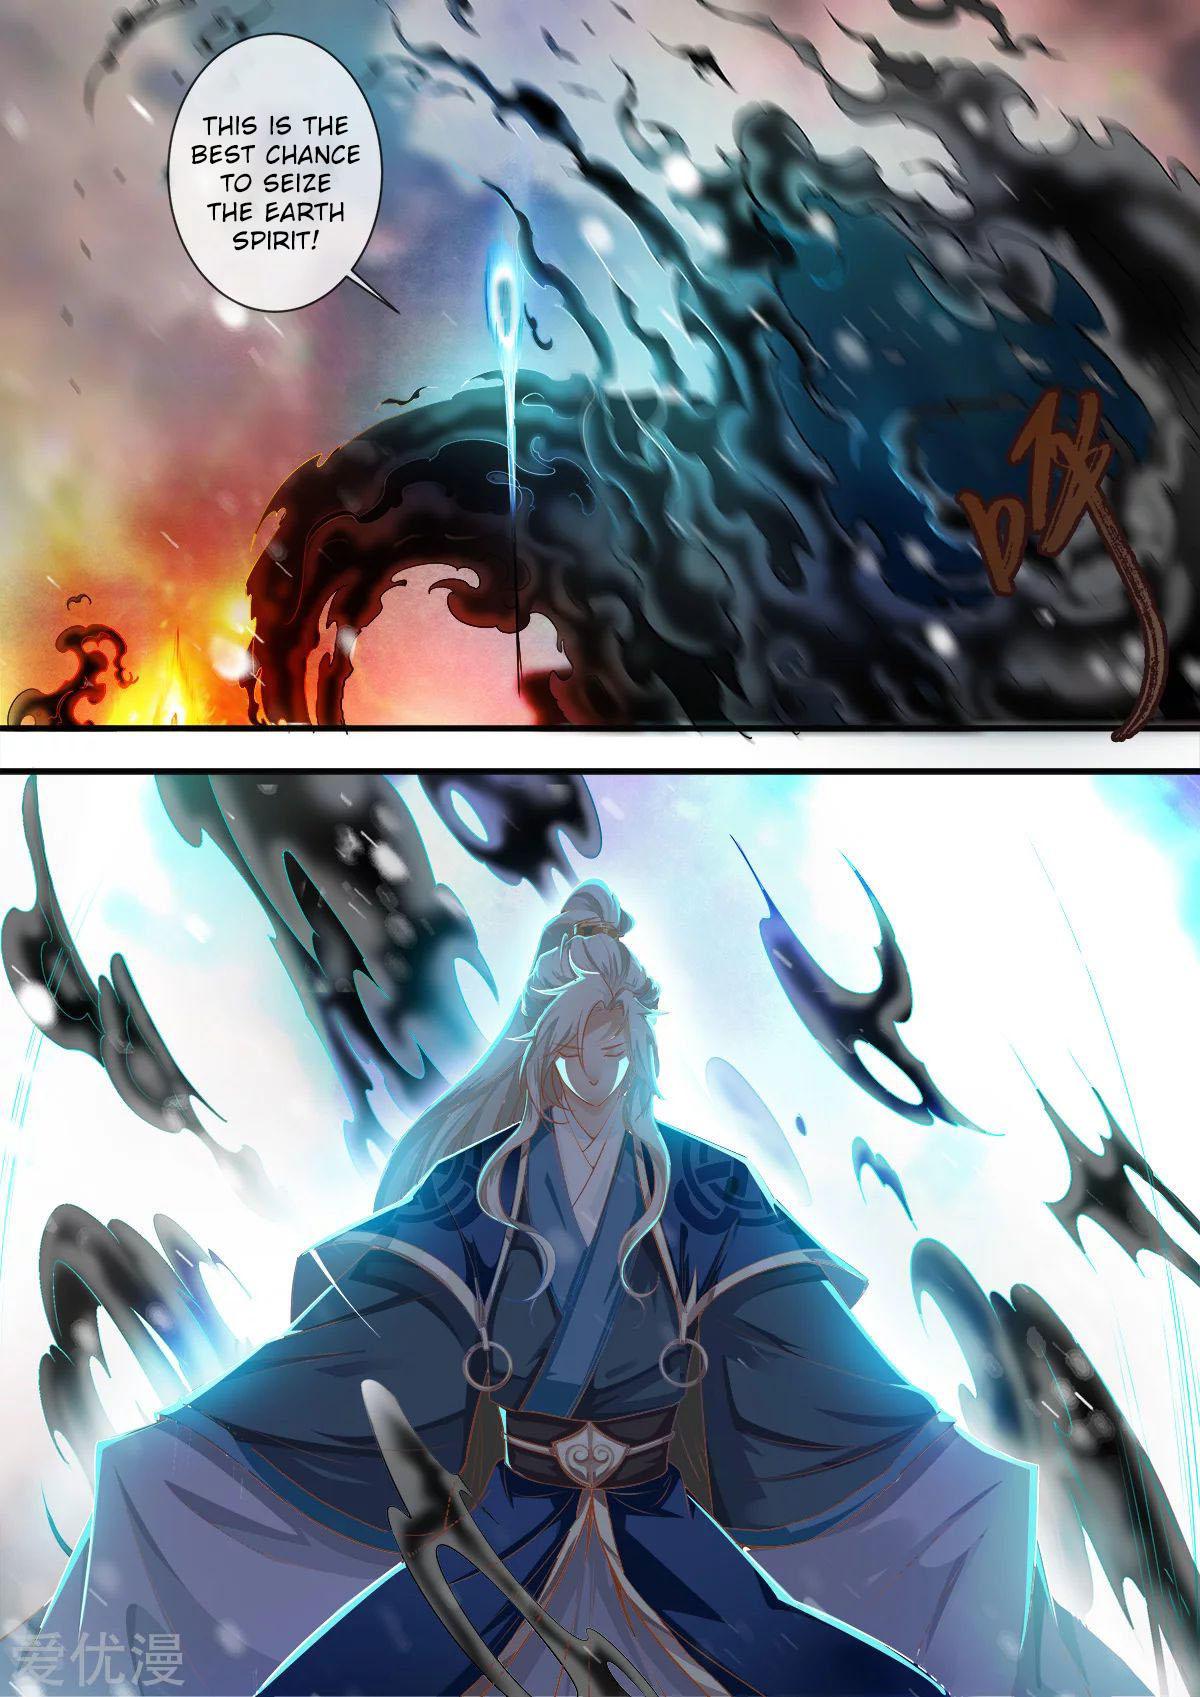 Xian Ni Chapter 167: Seizing The Earth Spirit page 23 - Mangakakalots.com